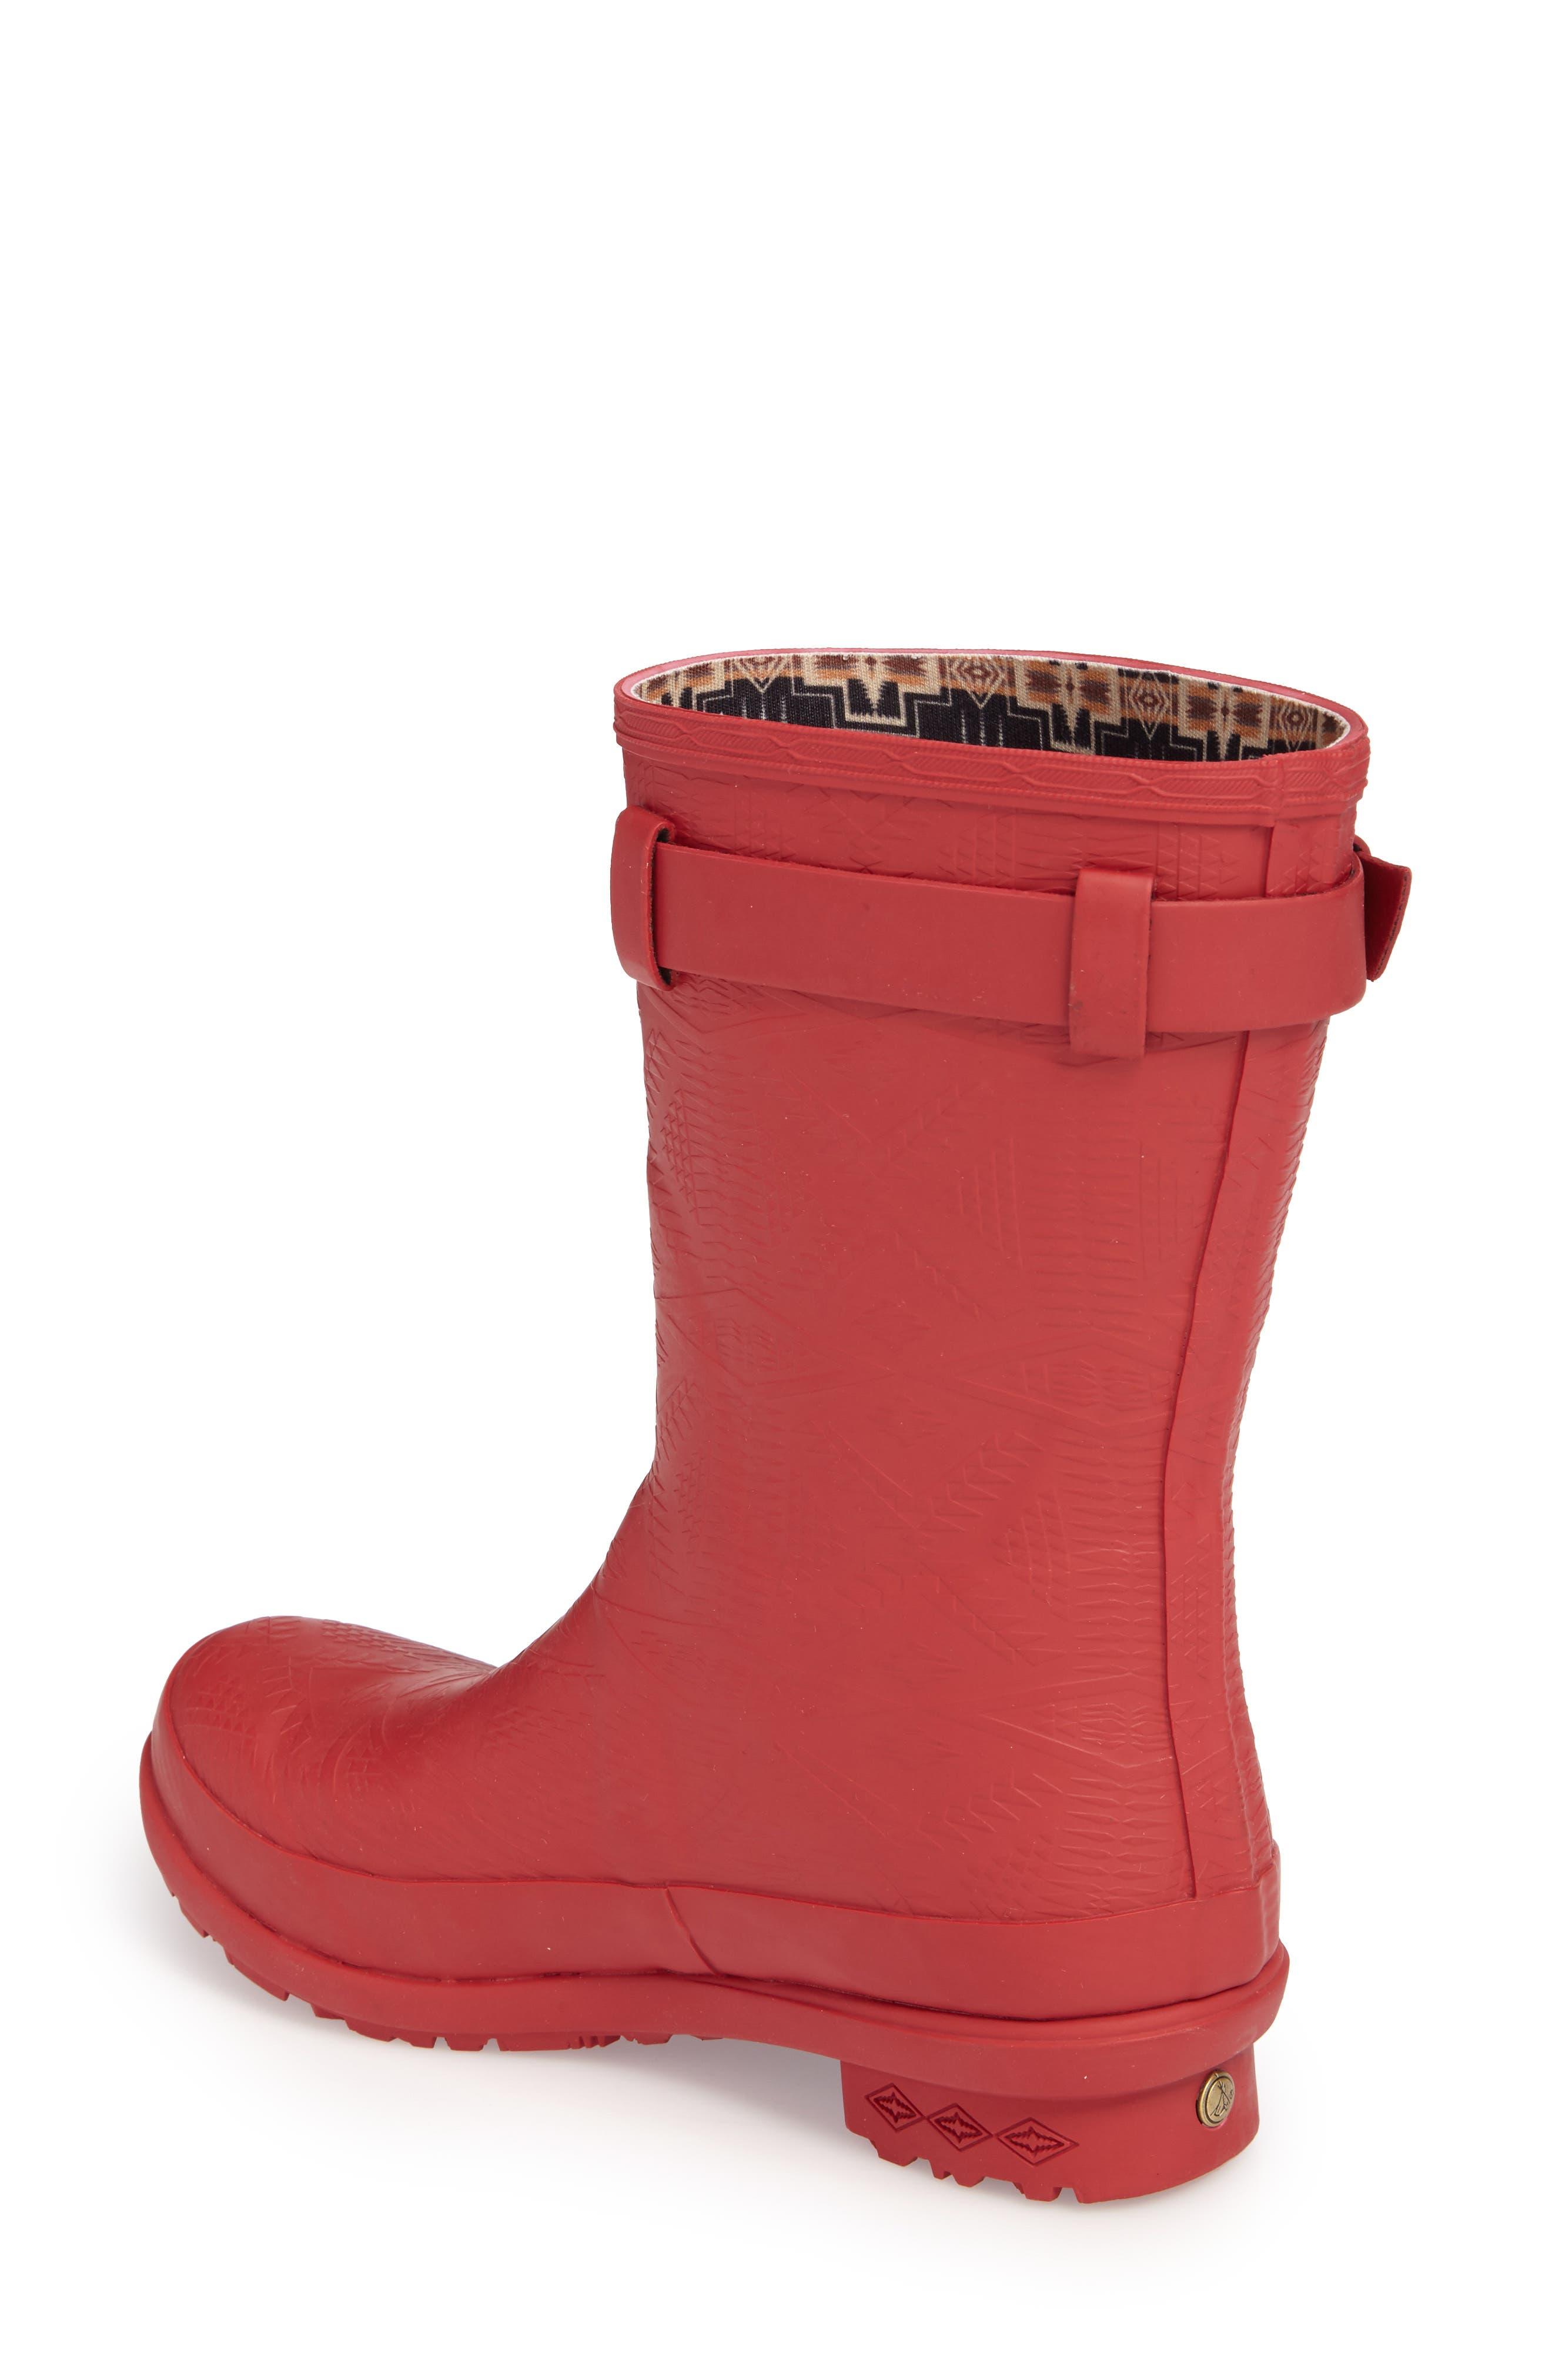 PENDLETON, Embossed Short Waterproof Rain Boot, Alternate thumbnail 2, color, SCARLET